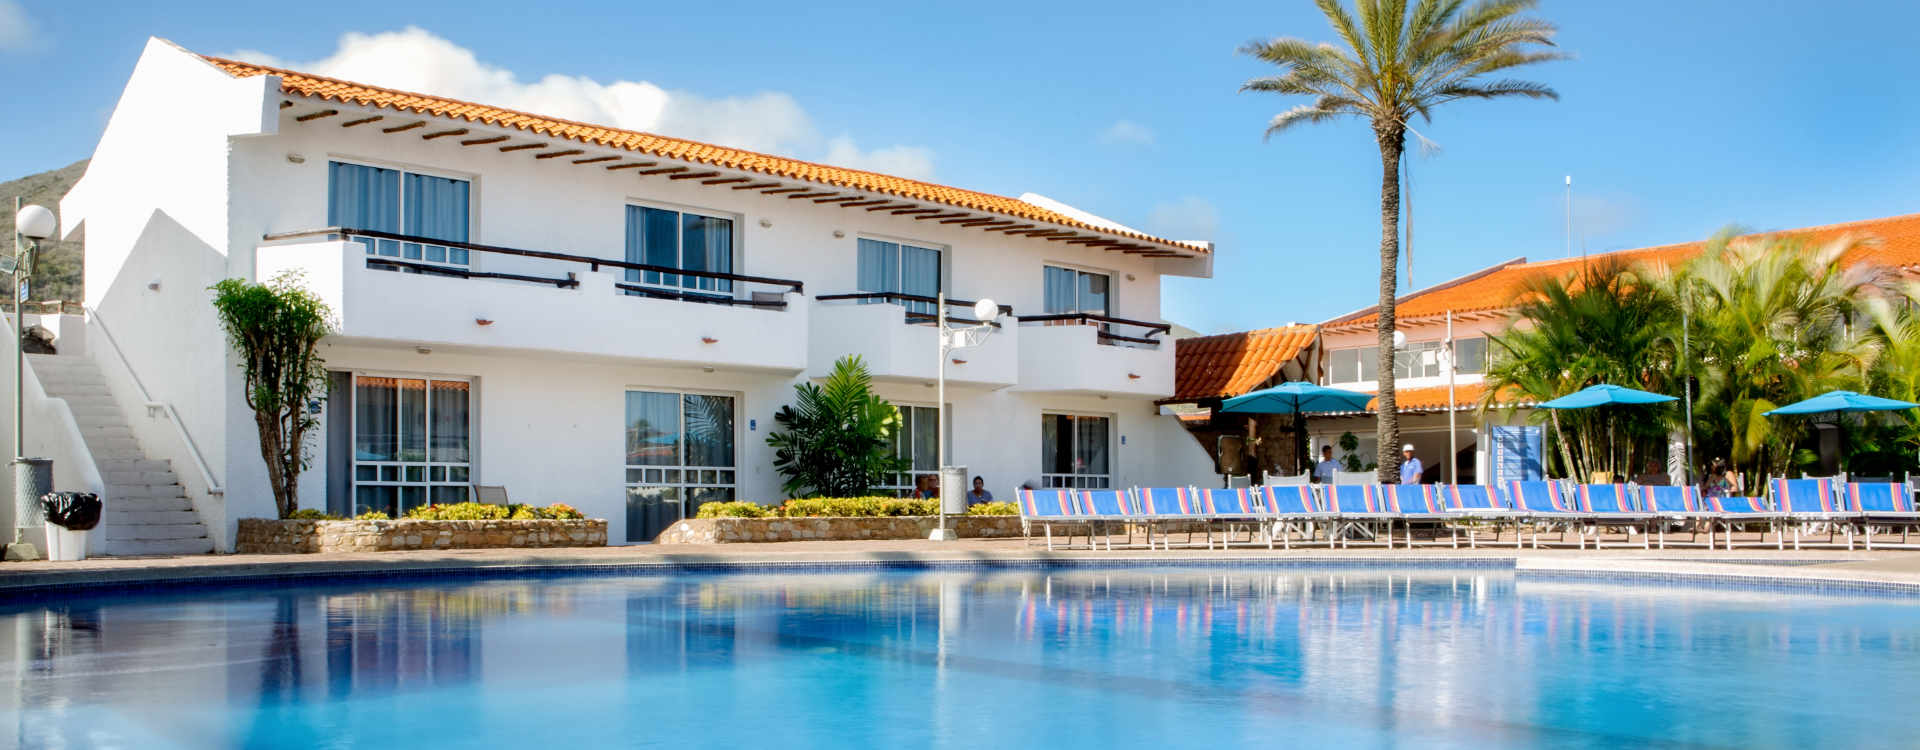 Hotel Palm Beach Piscina